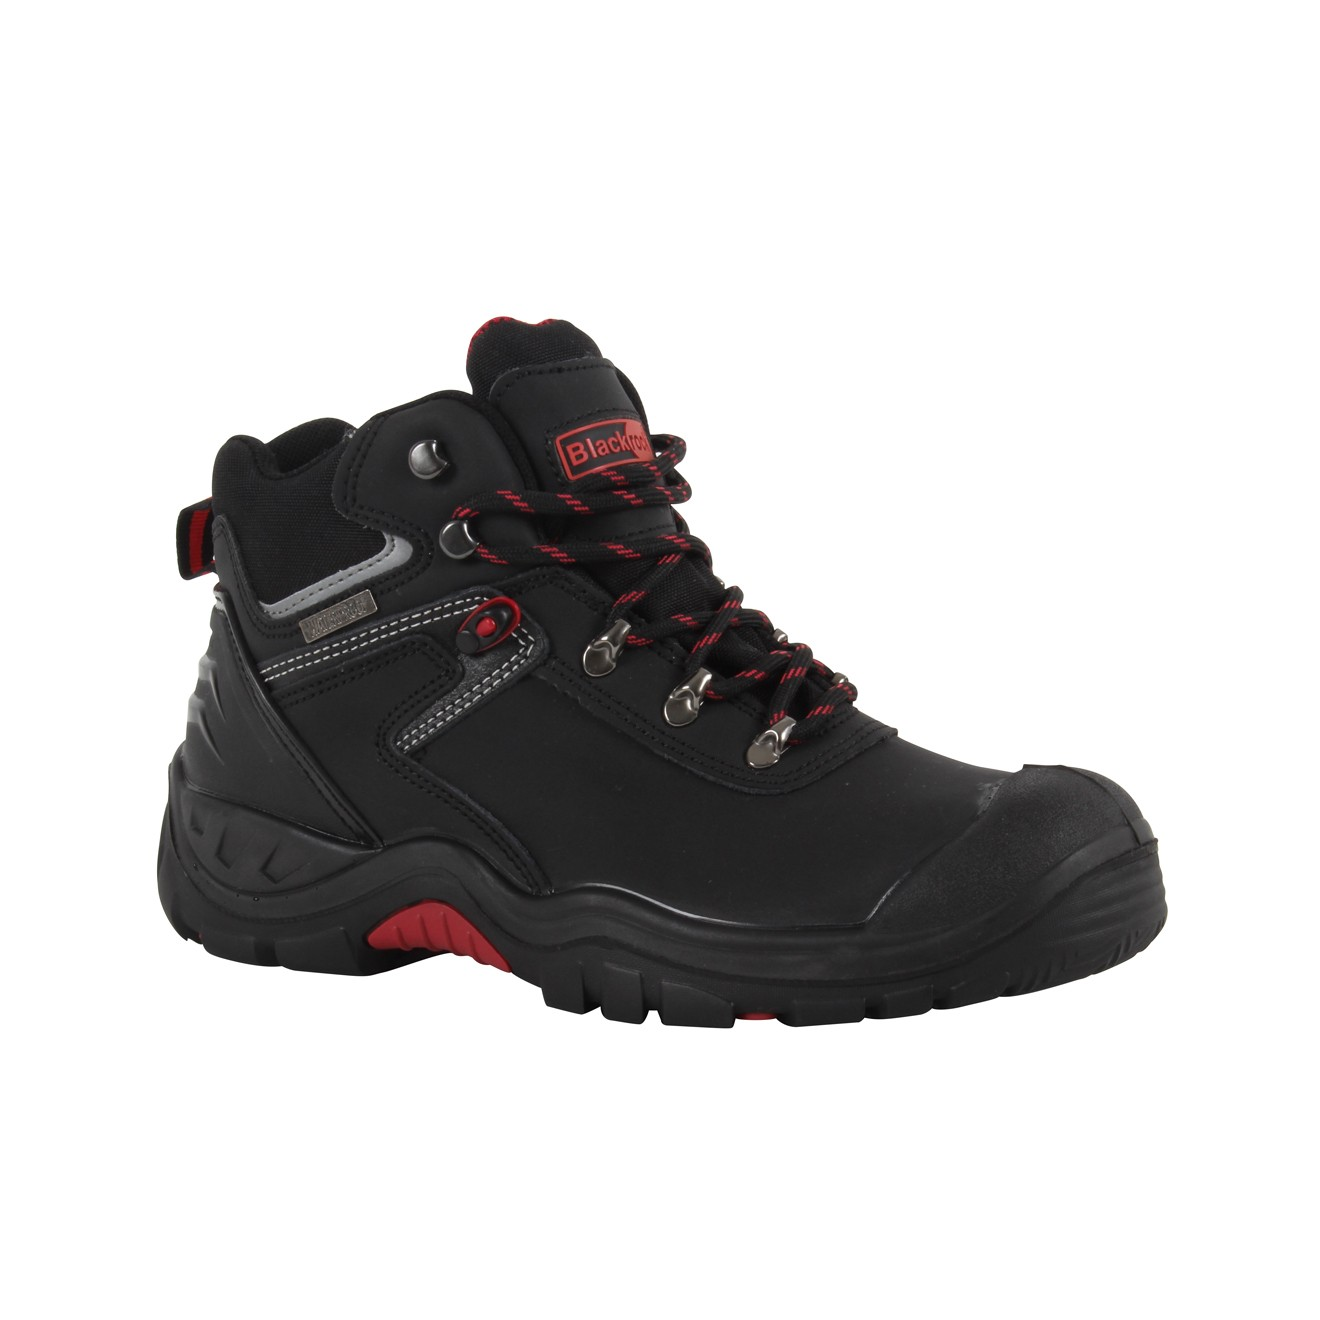 Tempest Waterproof Work Boots